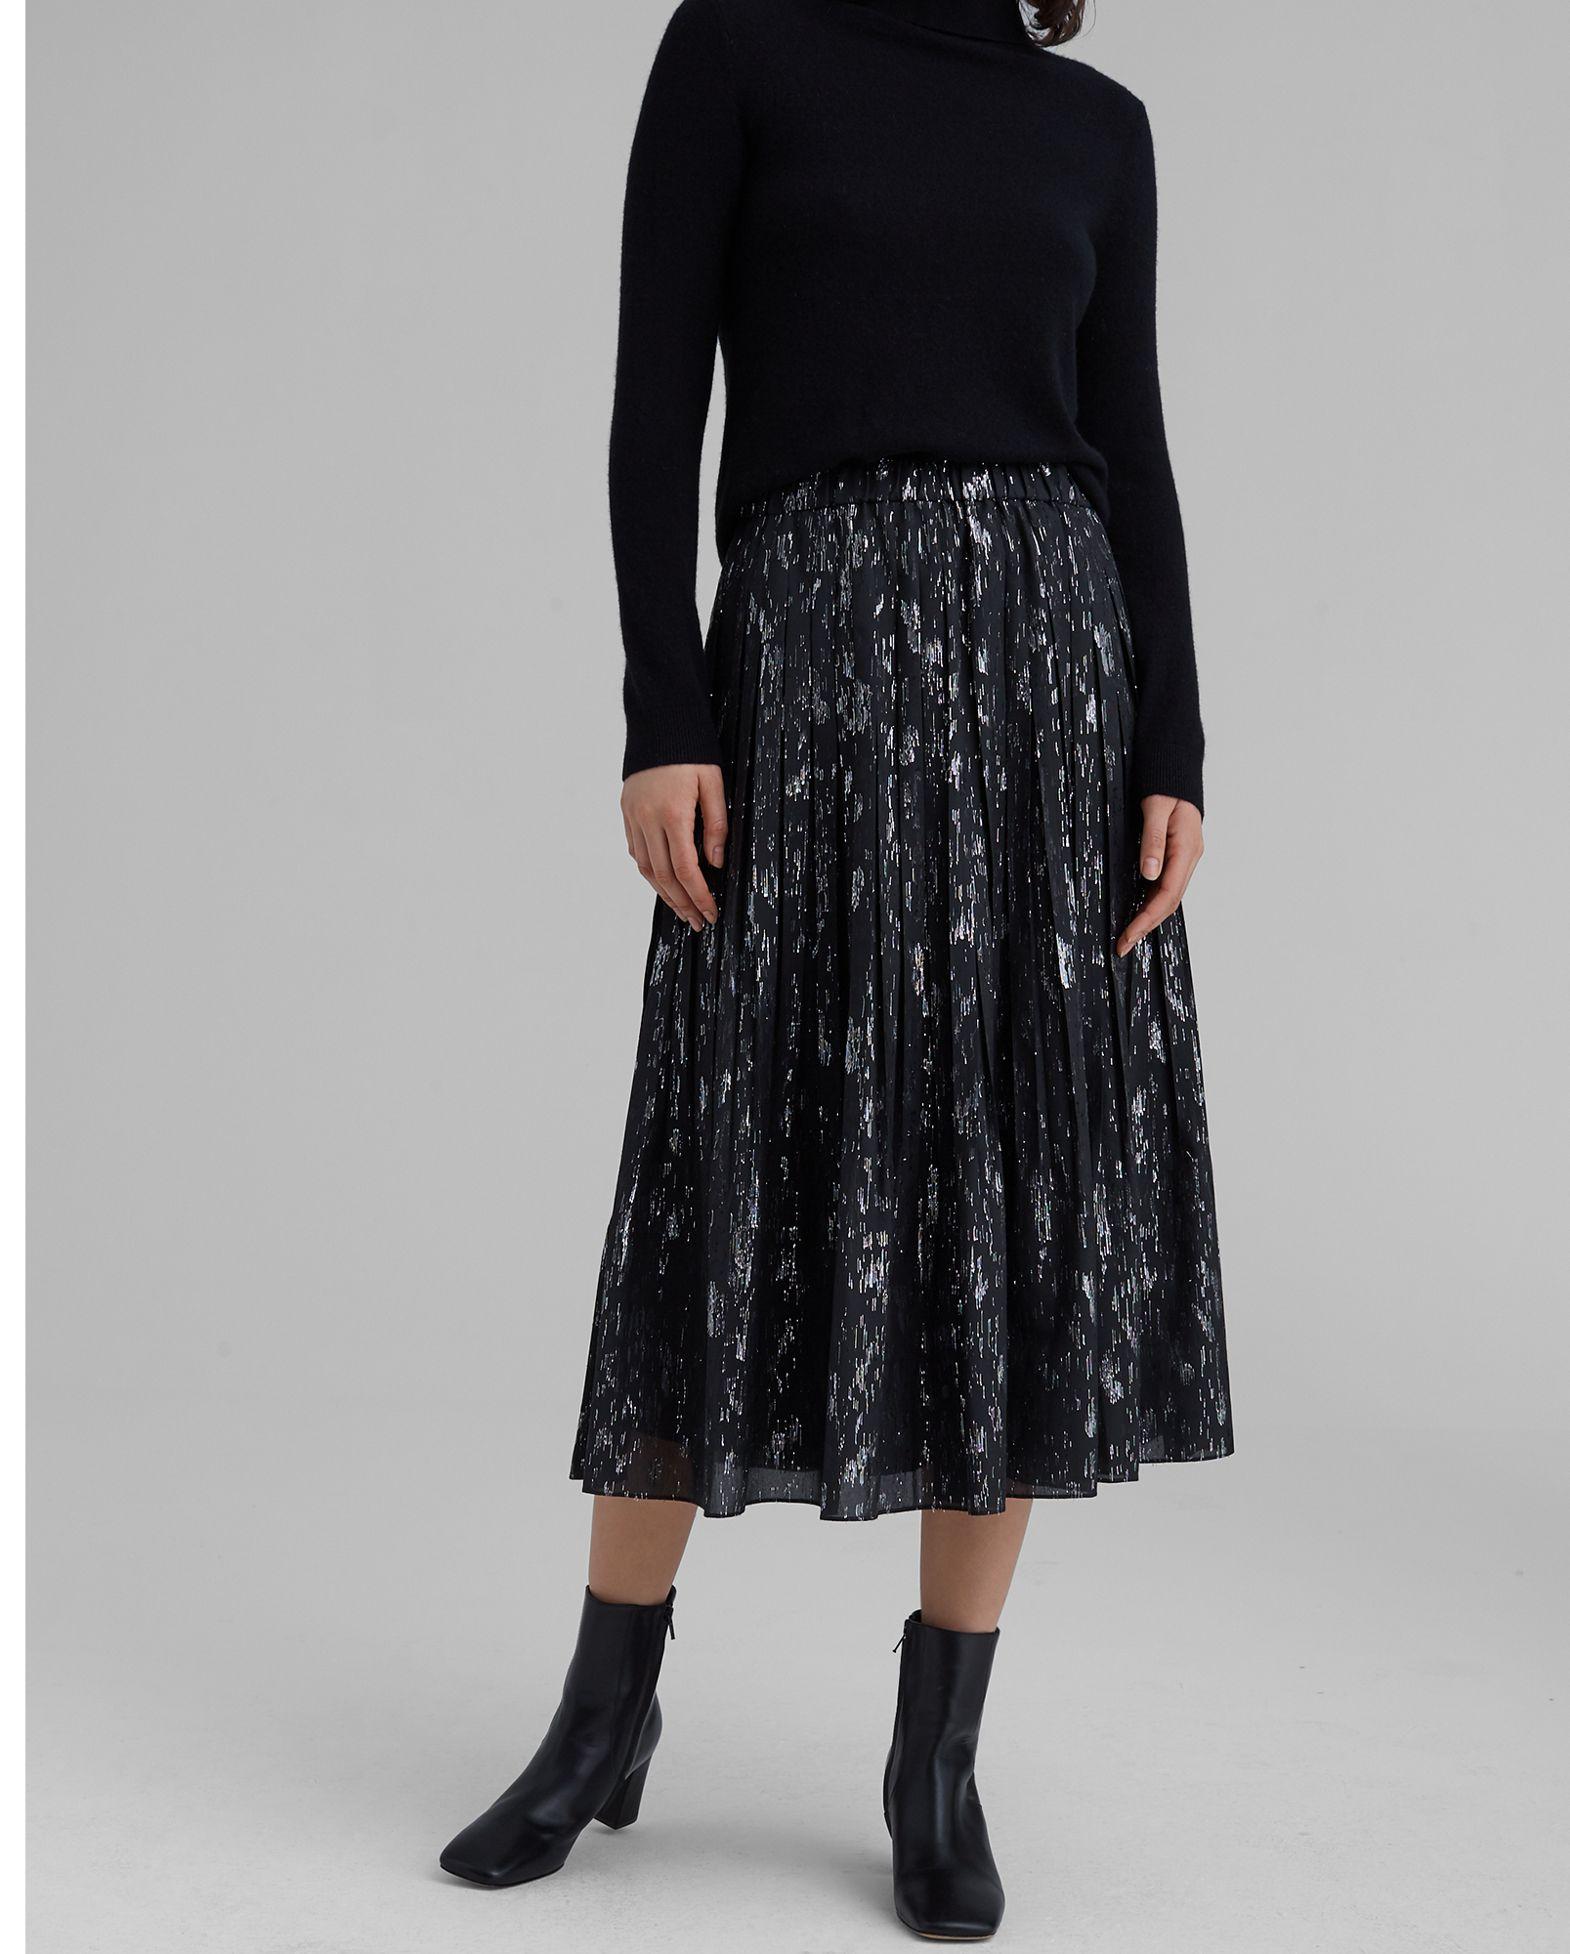 CLUB MONACO Metallic Pleated Skirt